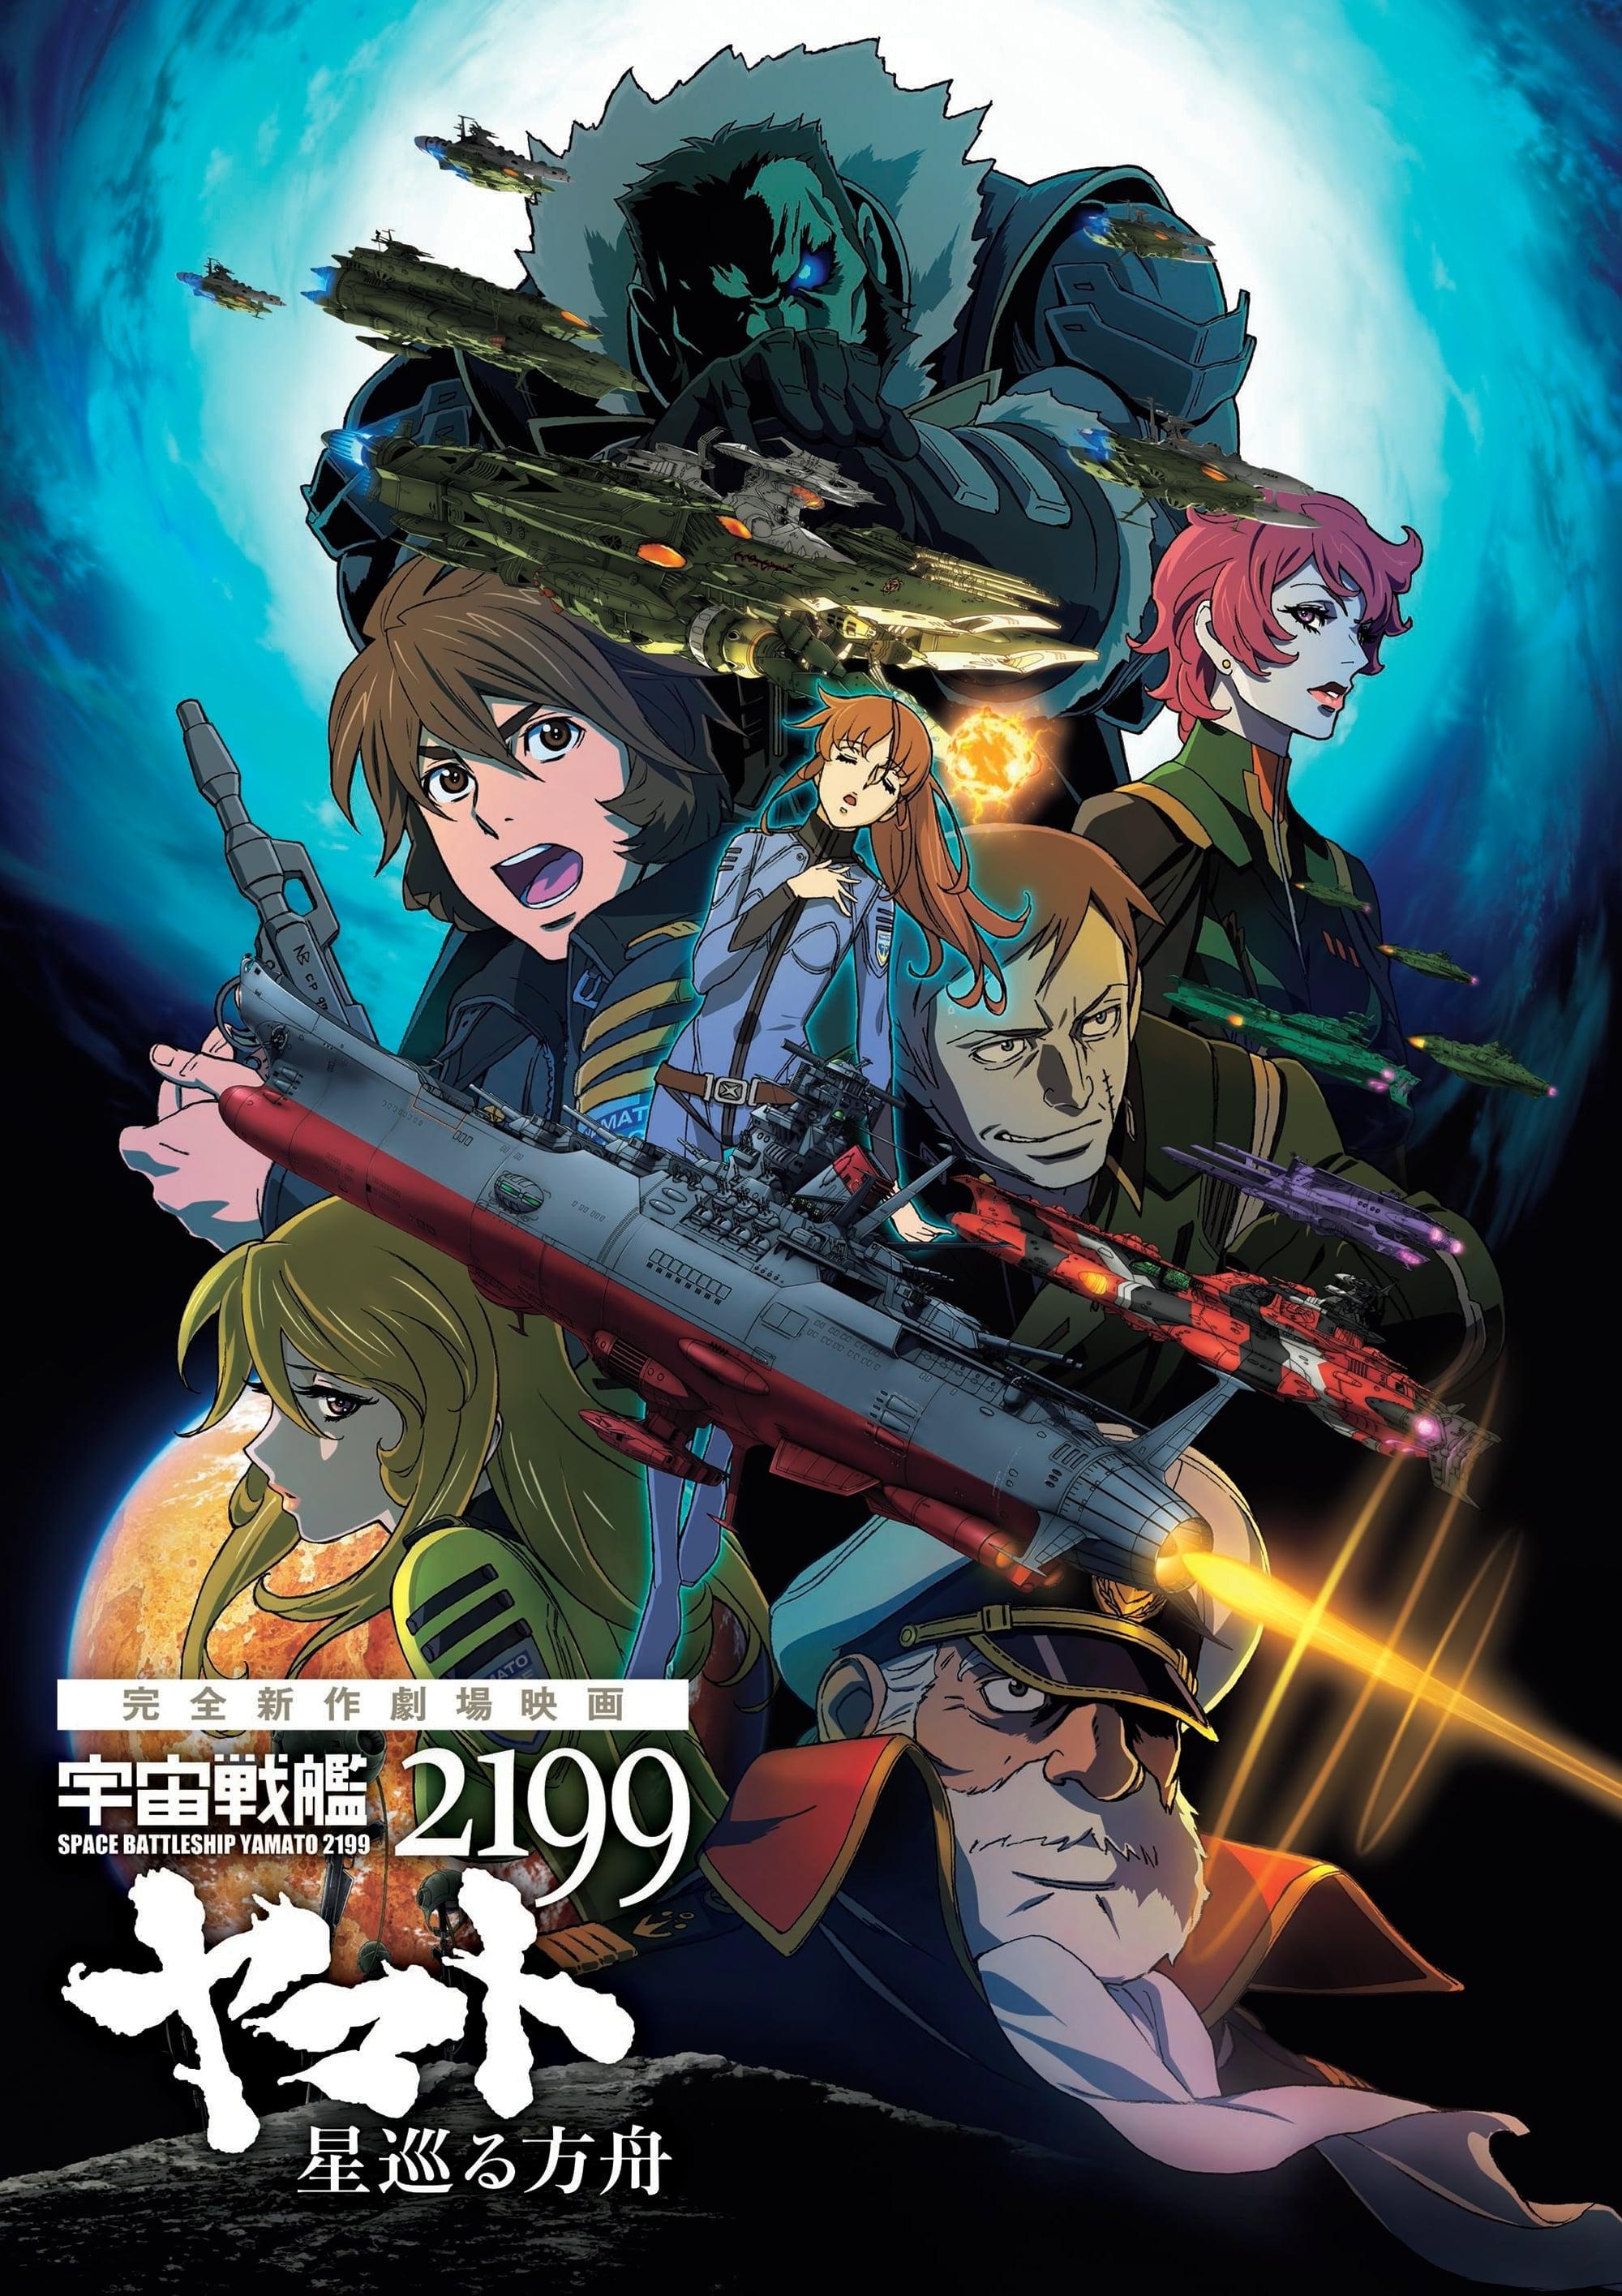 Star Blazers [Space Battleship Yamato] 2199: Odyssey of the Celestial Ark